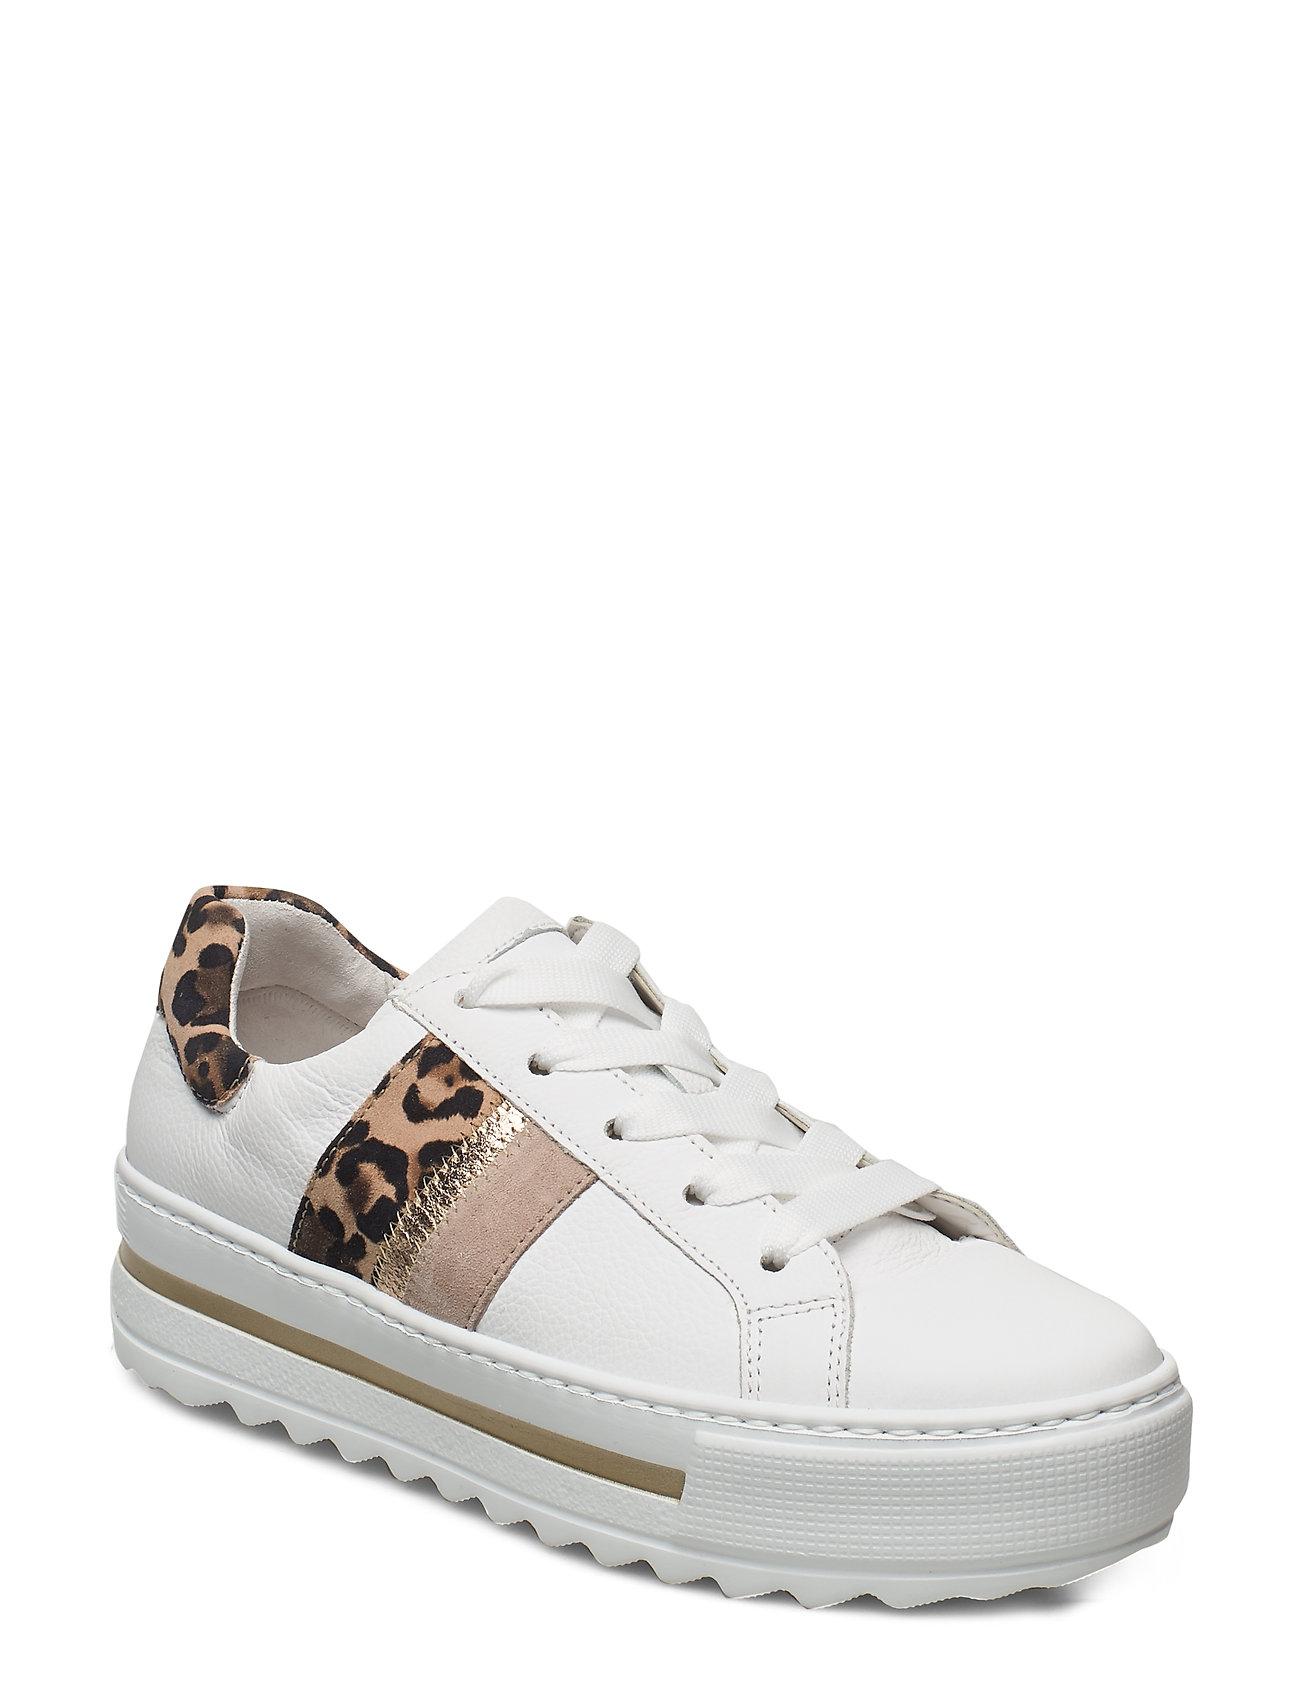 Image of Sneaker Low-top Sneakers Hvid Gabor (3359210343)